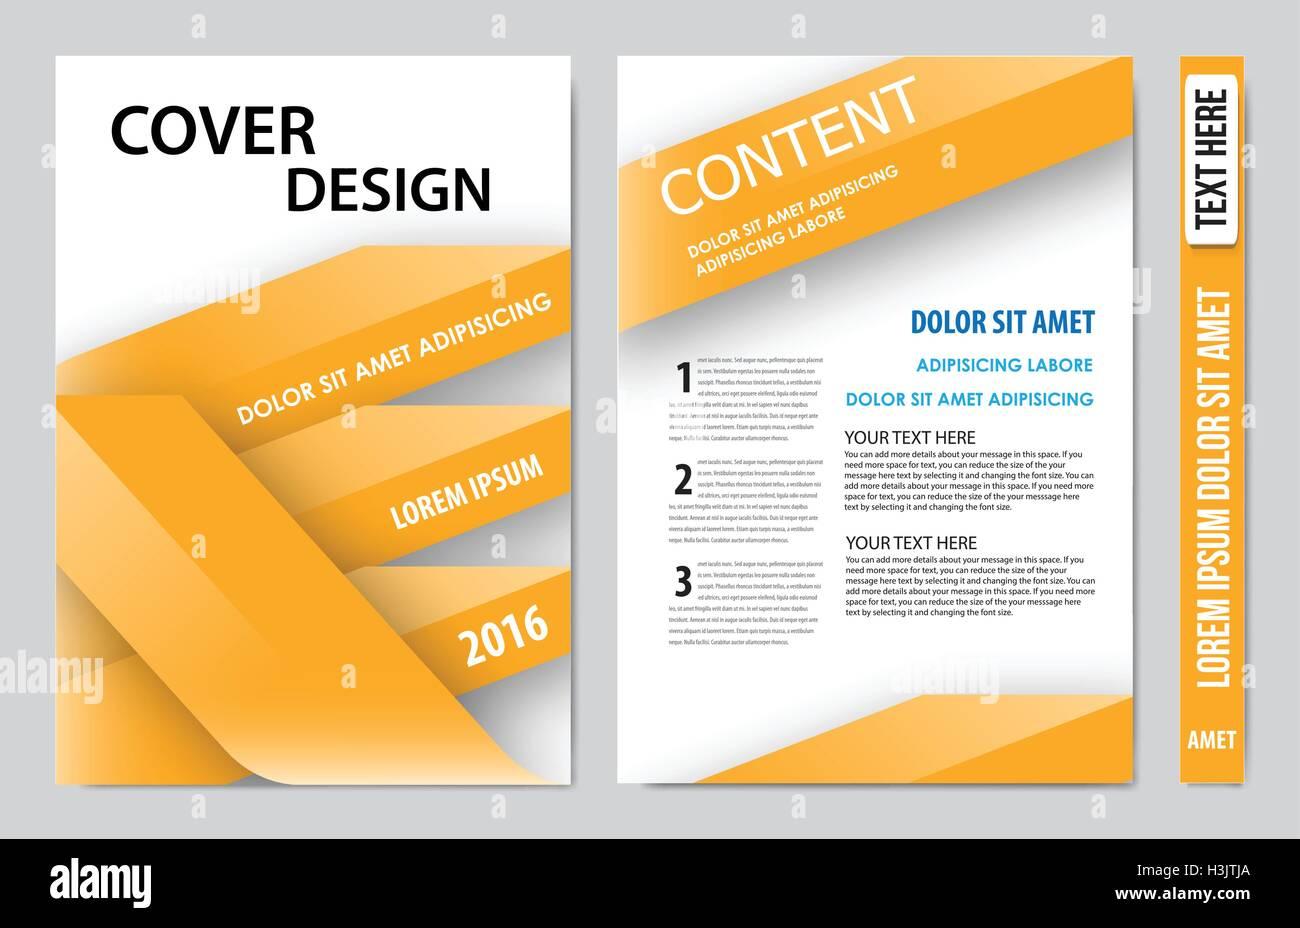 Cover Book Presentation Report Design Template Stock Vector Image Art Alamy